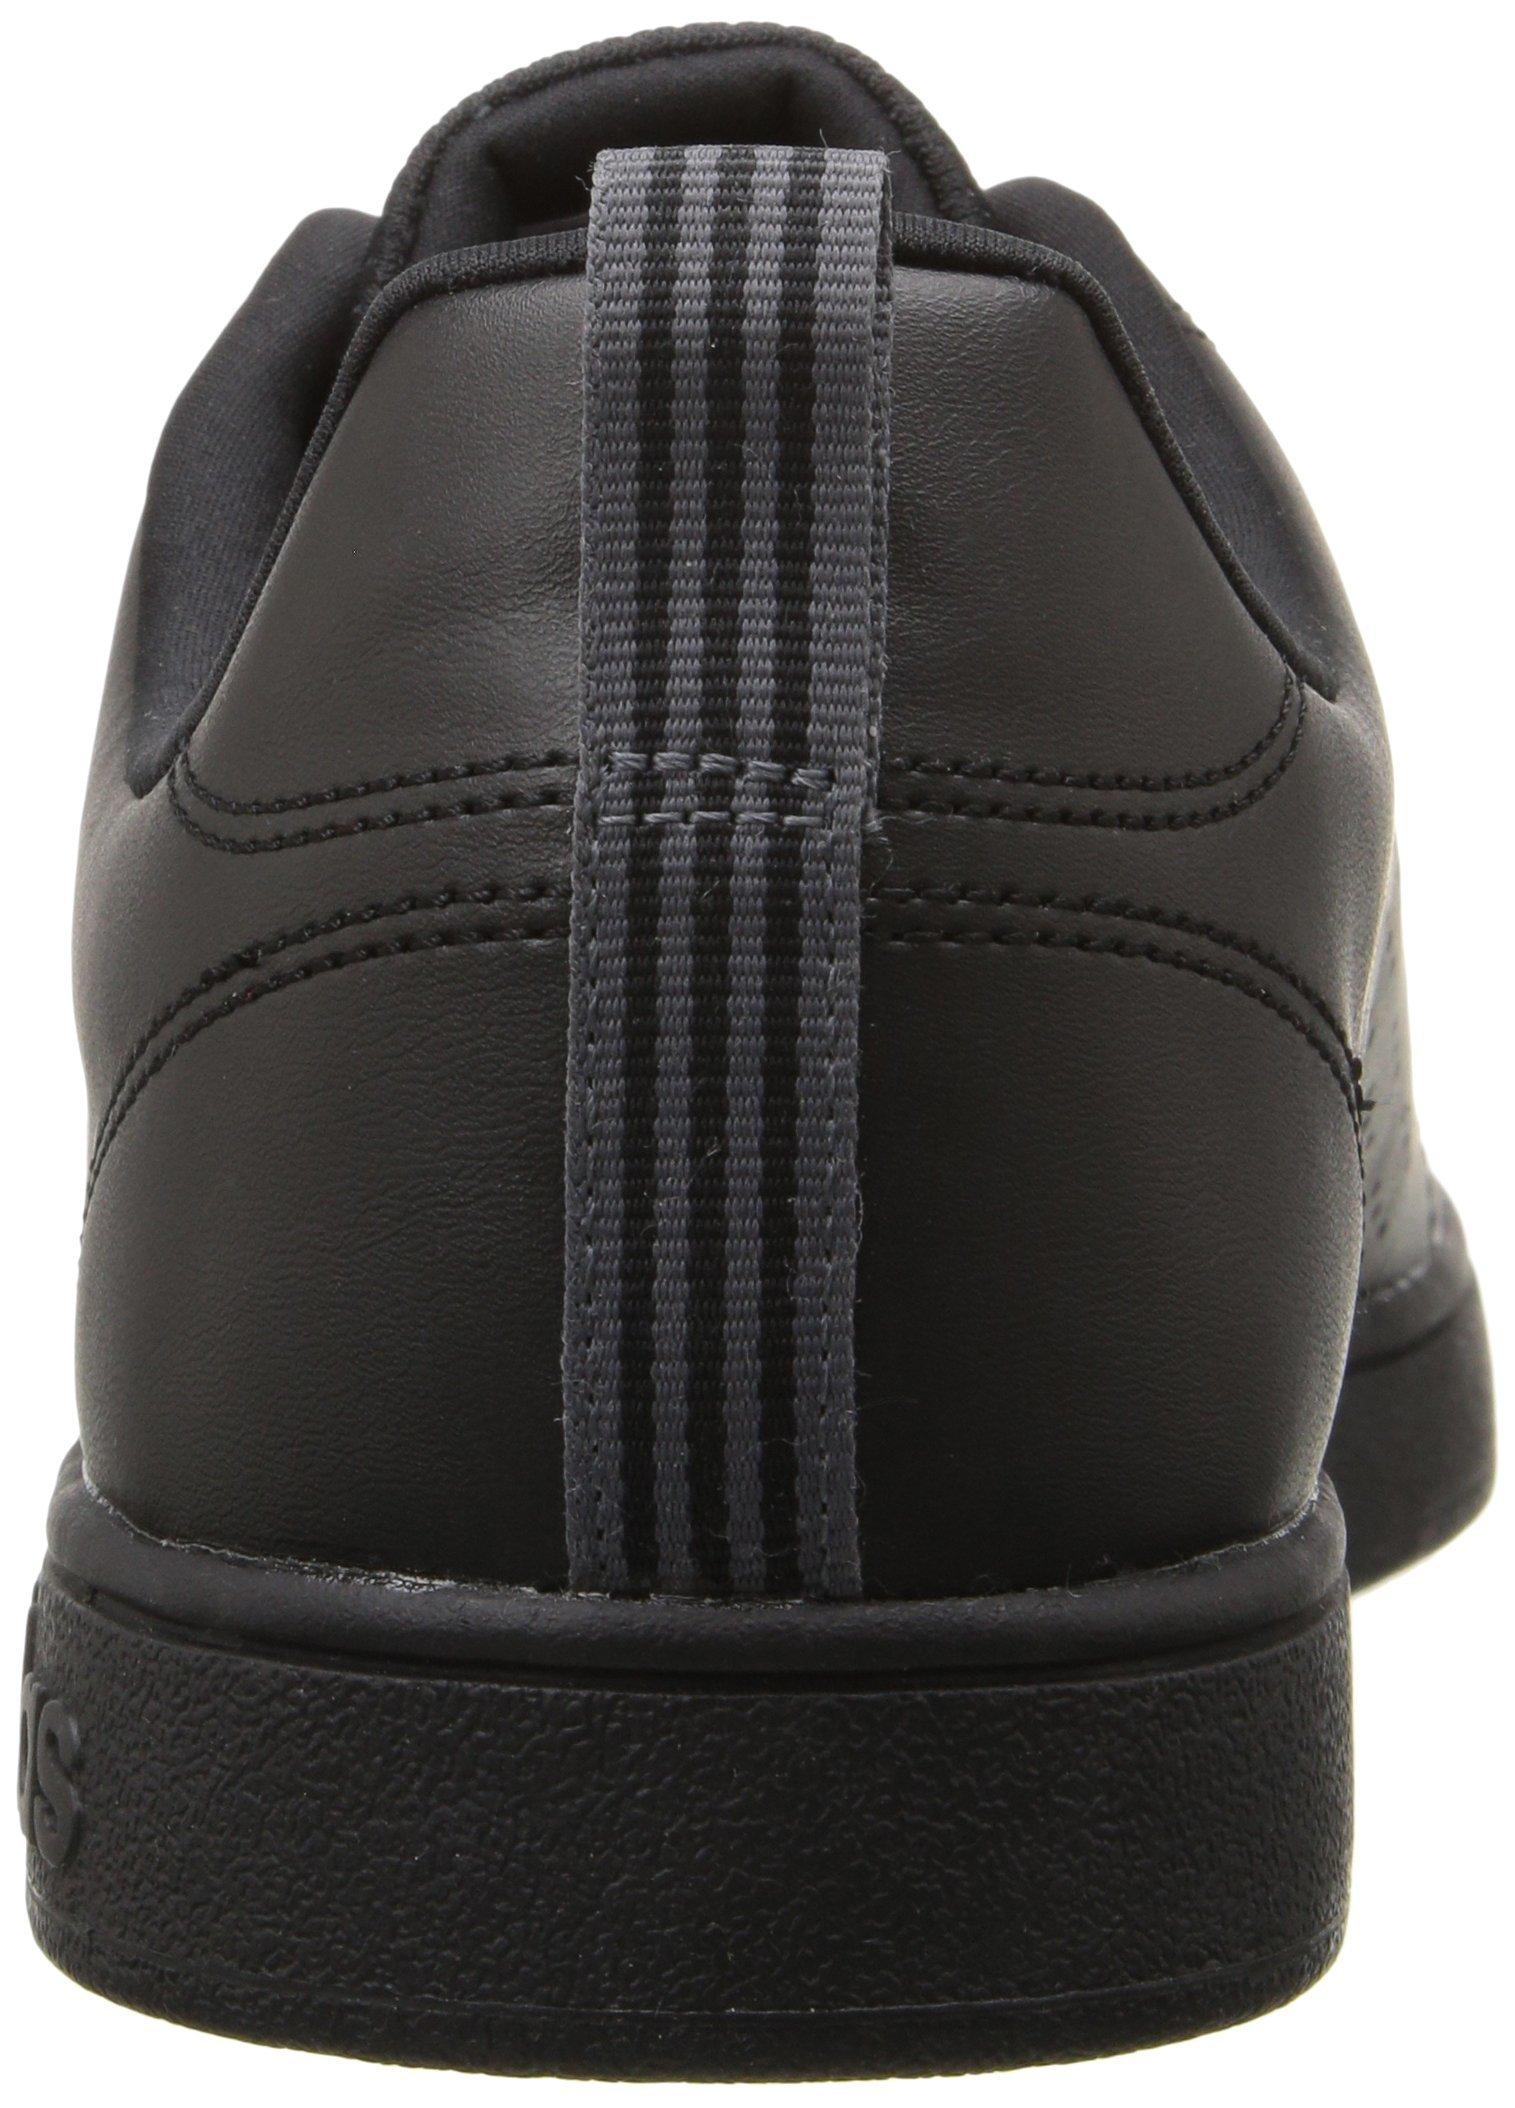 adidas neo advantage clean sneaker ph